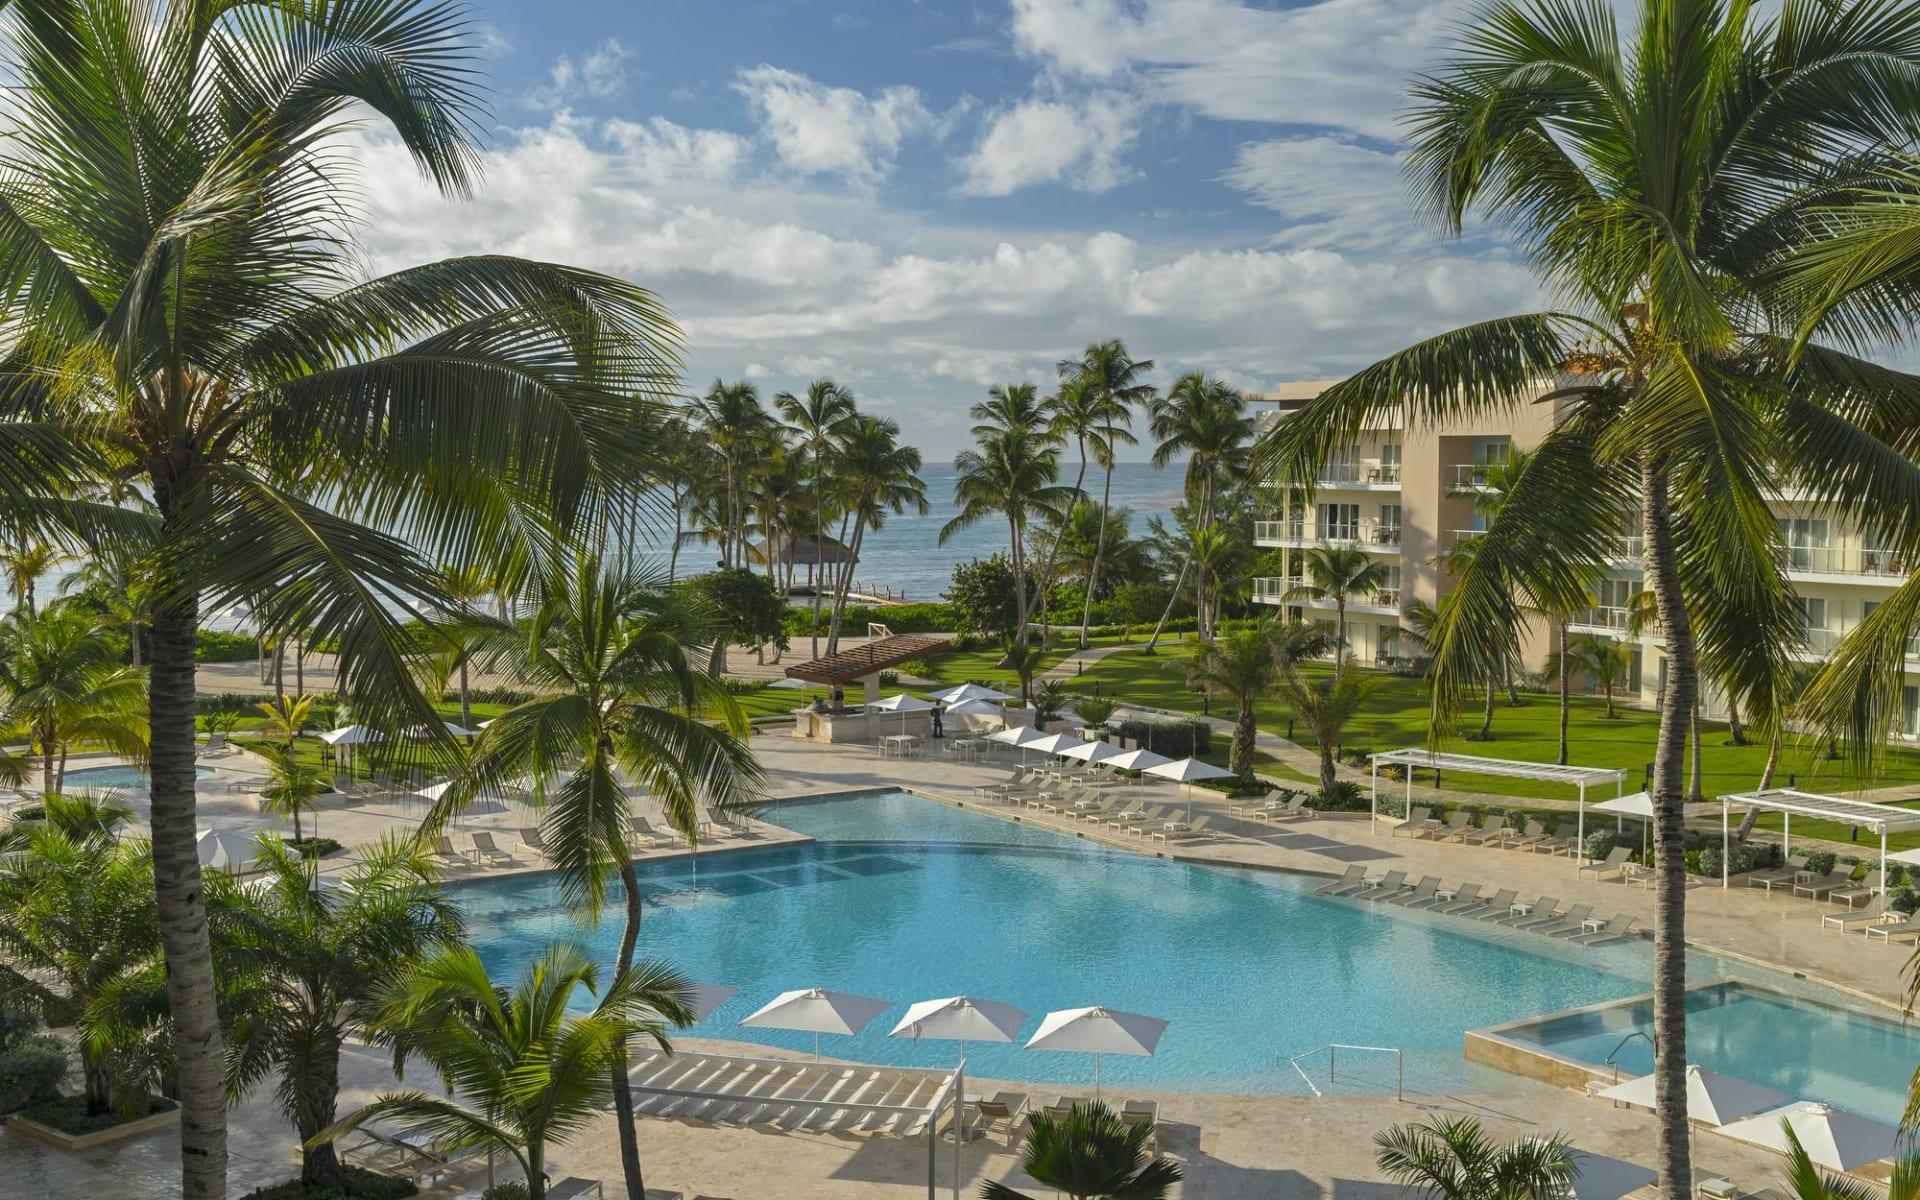 Westin Punta Cana Resort & Club: Westin Punta Cana Resort & Club - Pool